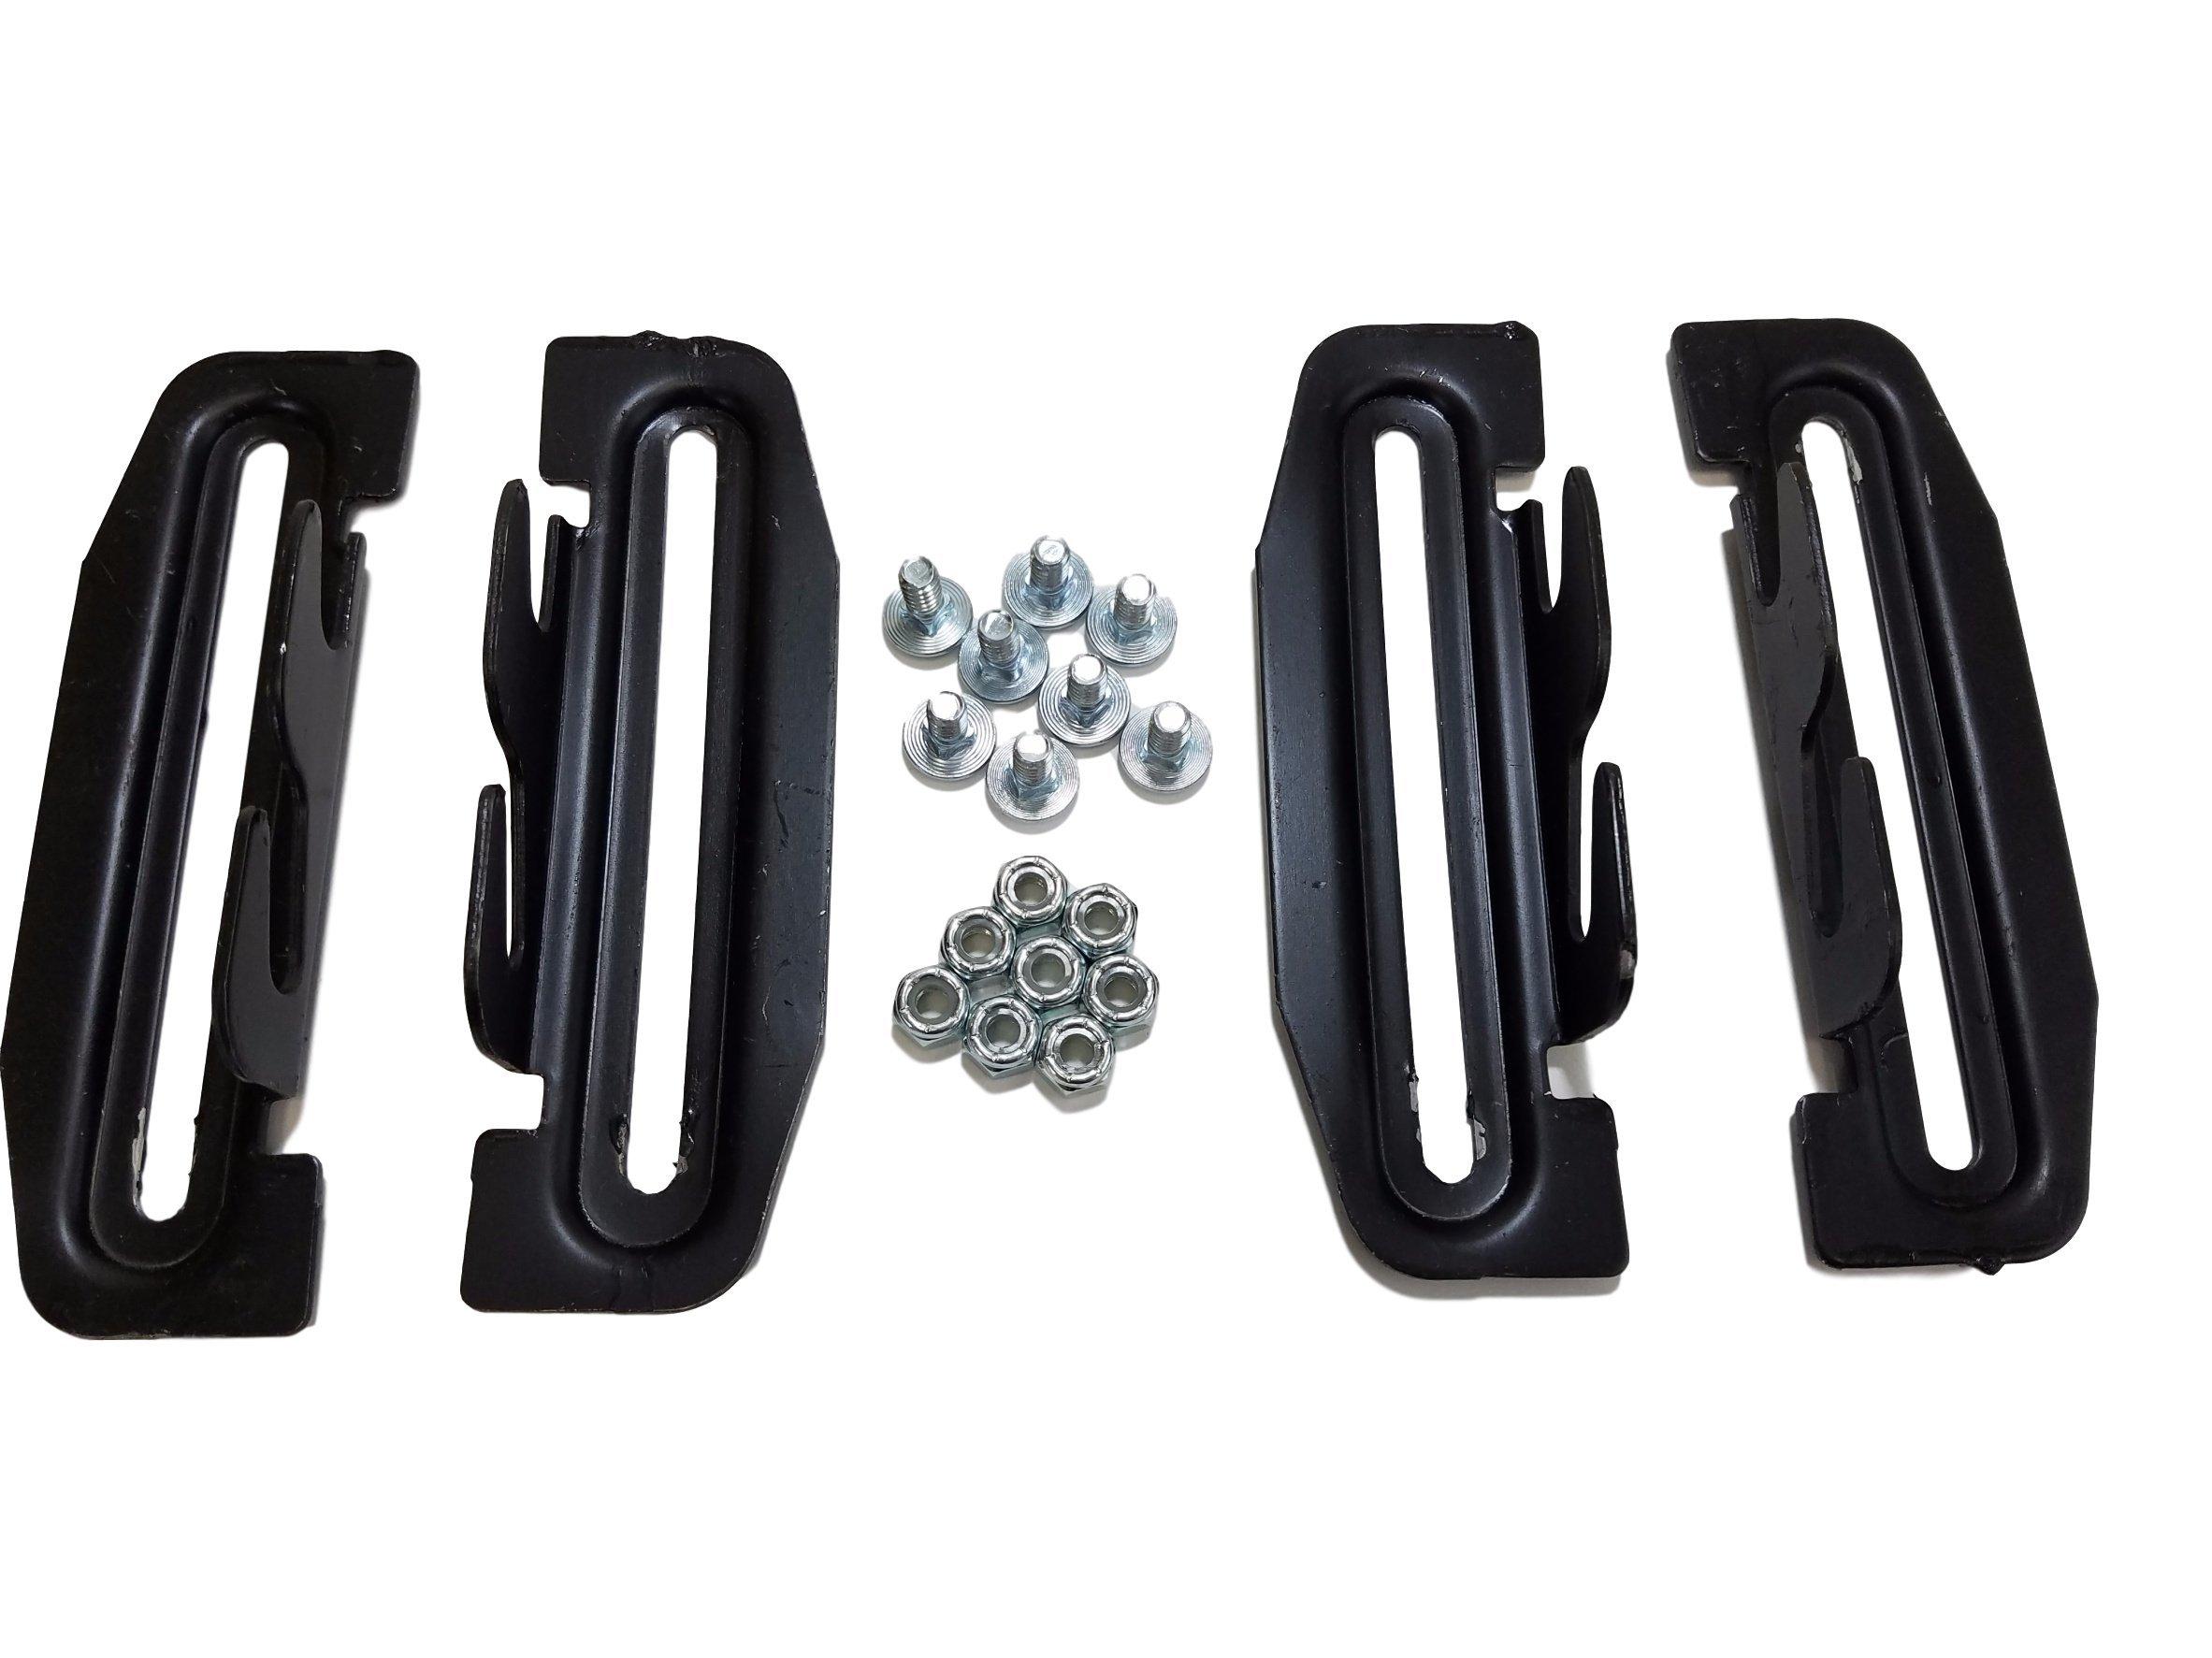 True Choice Headboard Footboard Bolt On to Hook On Plate Adapter Kit #35